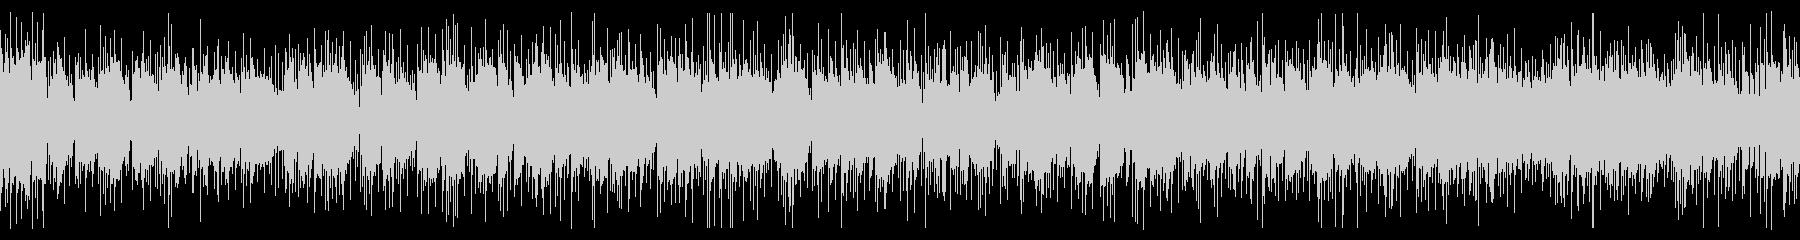 "Chopin ""Revolution"" Guitar ver.'s unreproduced waveform"